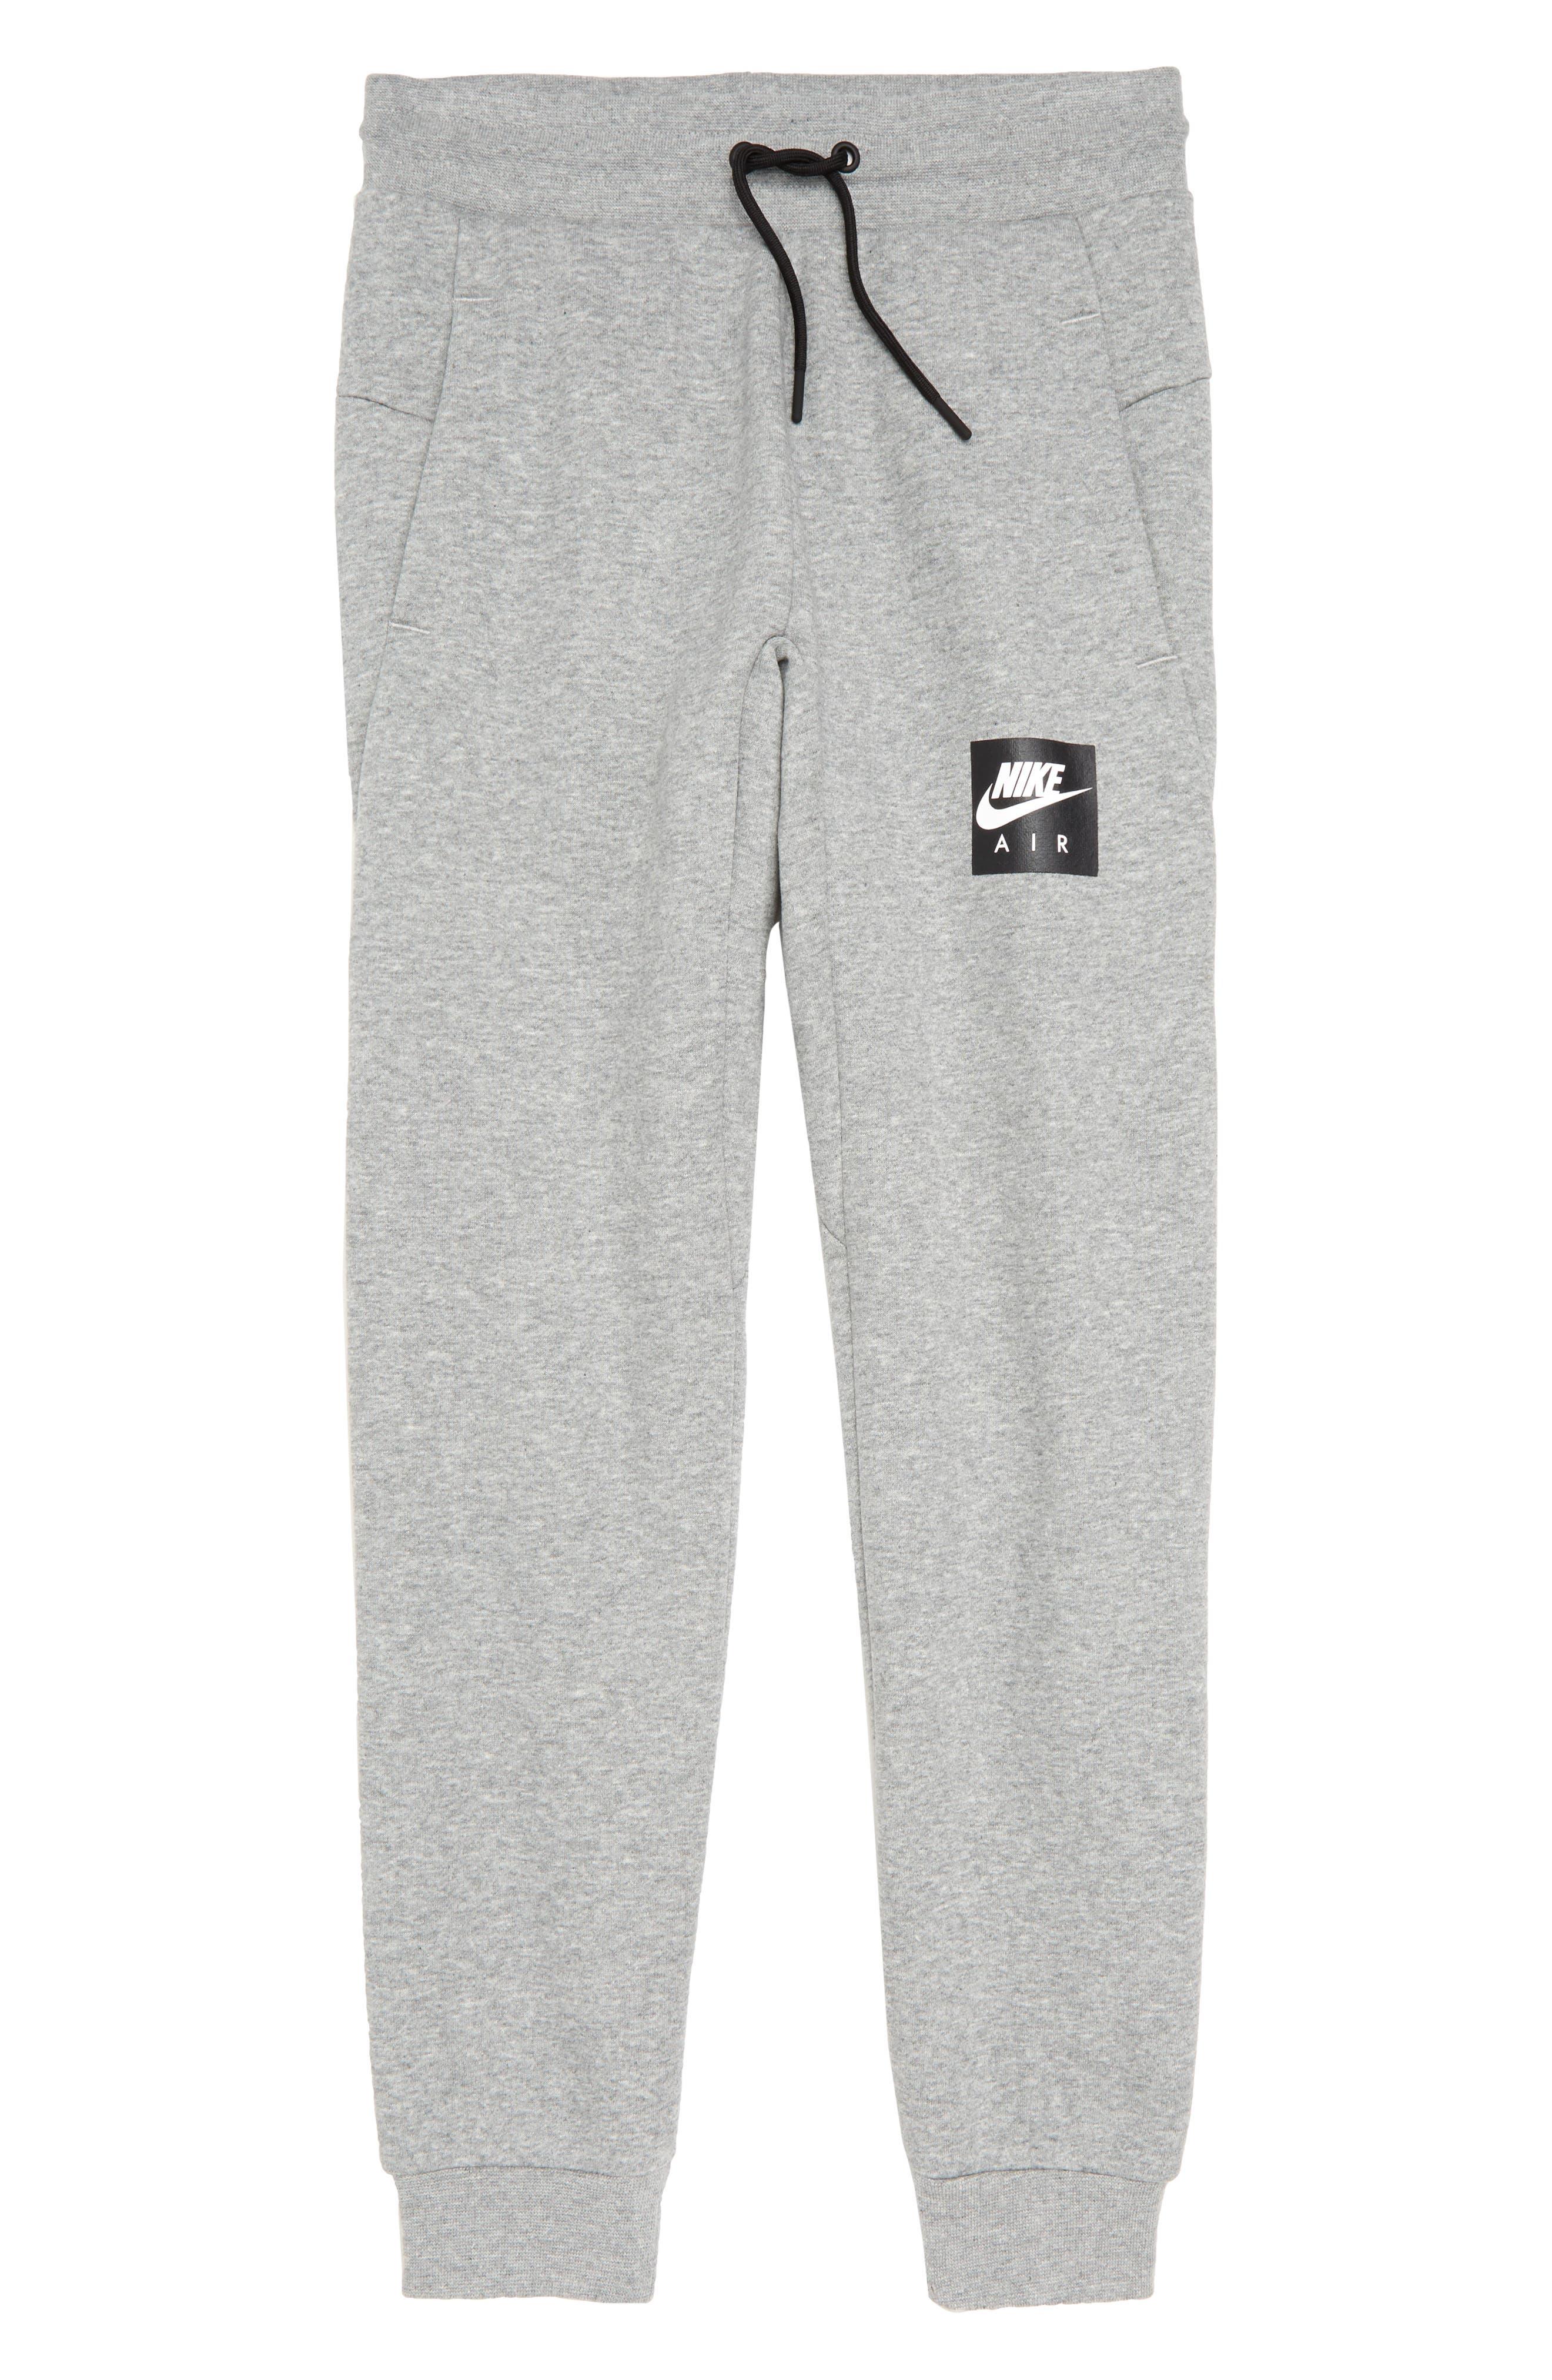 Air Fleece Jogger Pants,                             Main thumbnail 1, color,                             DARK GREY HEATHER